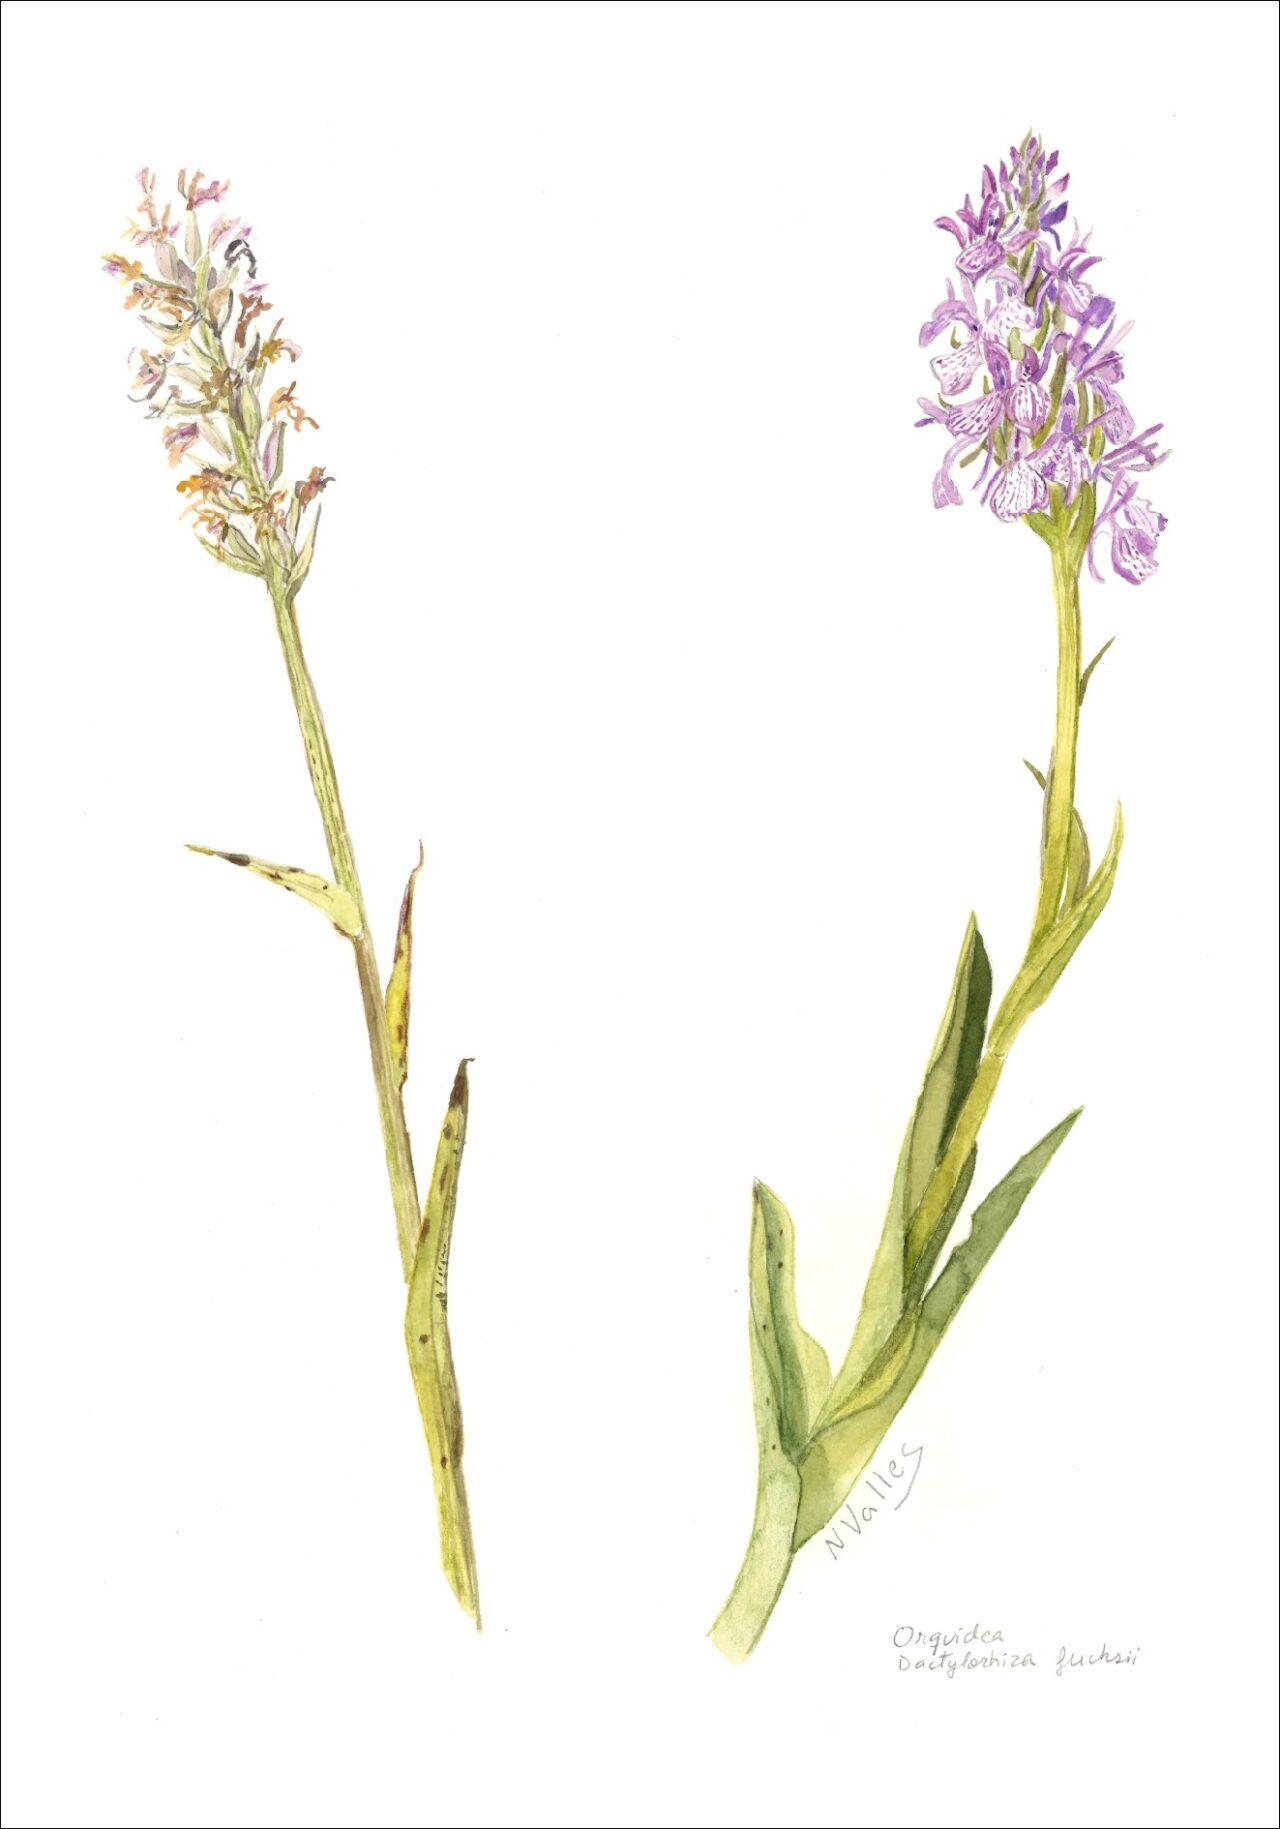 Dactylorniza fuchsii Orquídea de muntanya - Orquidea de montana - Common spotted orquid